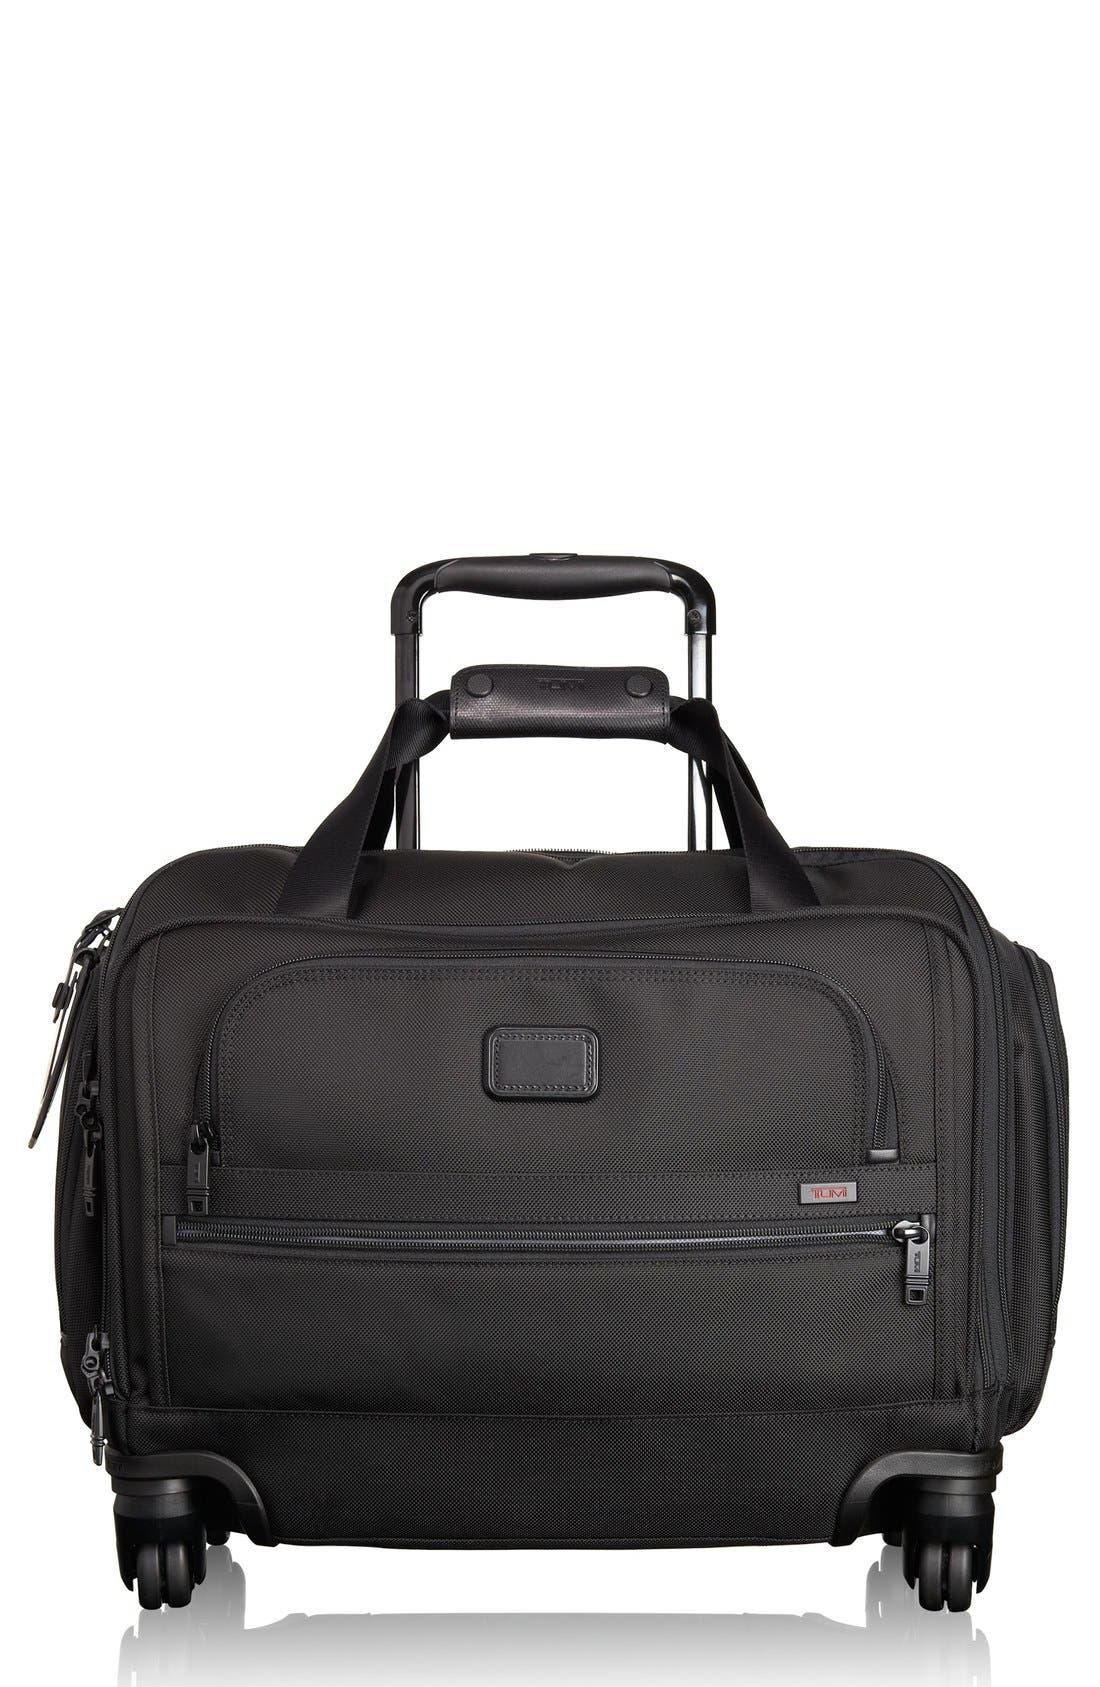 TUMI Alpha 2 Wheeled Duffel Bag